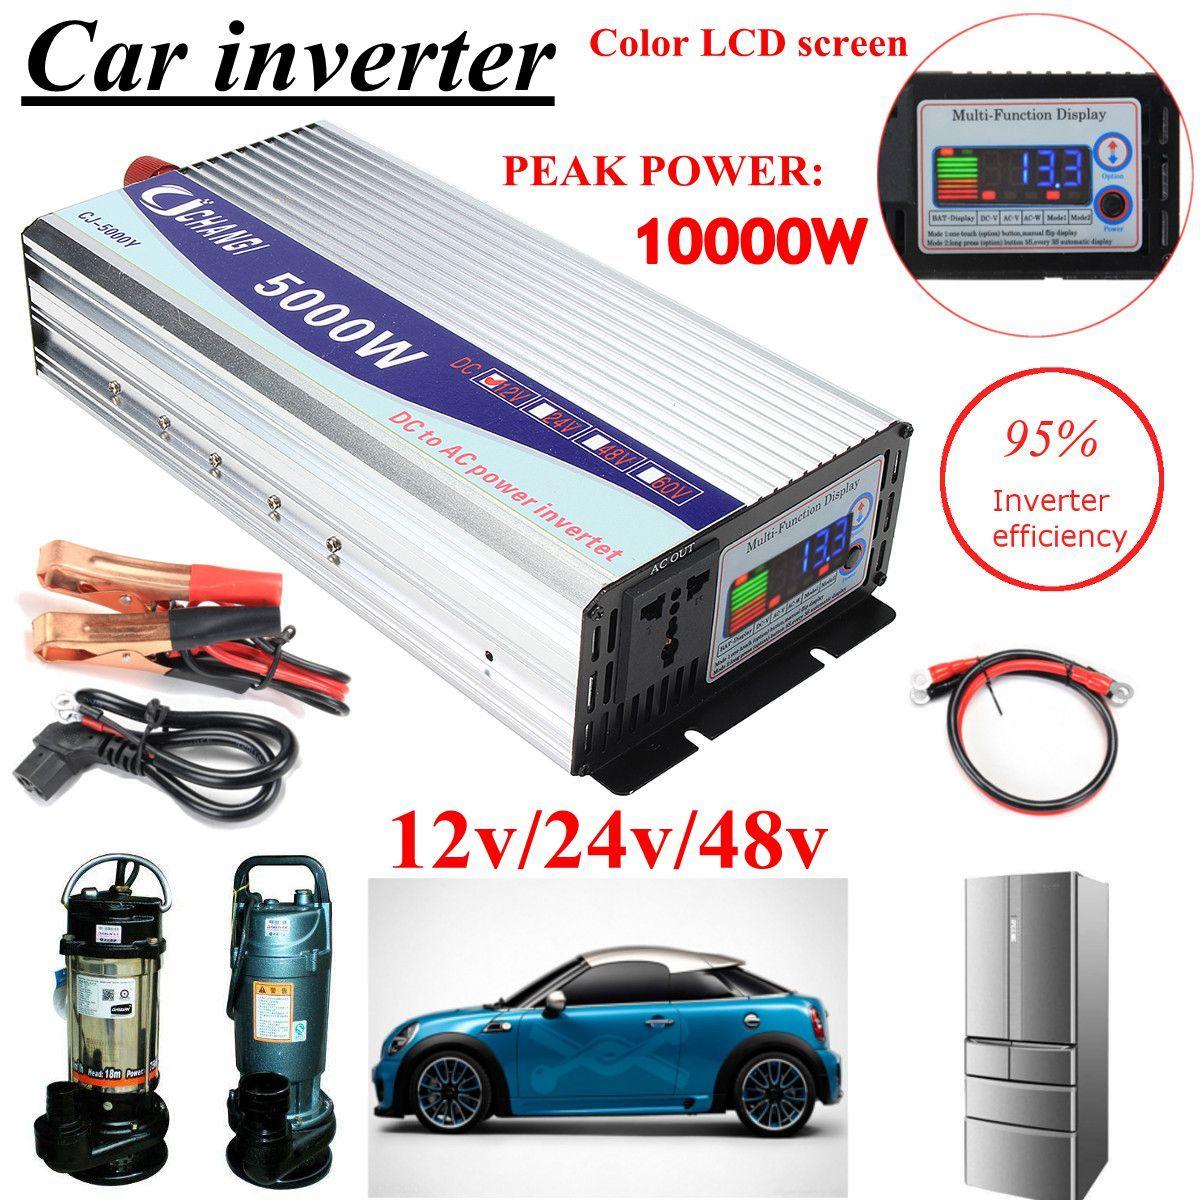 Inverter 12V/24V/48V 220V 5000W 10000W P eak Modified Sine Wave Power Voltage transformer Inverter Converter + LCD display